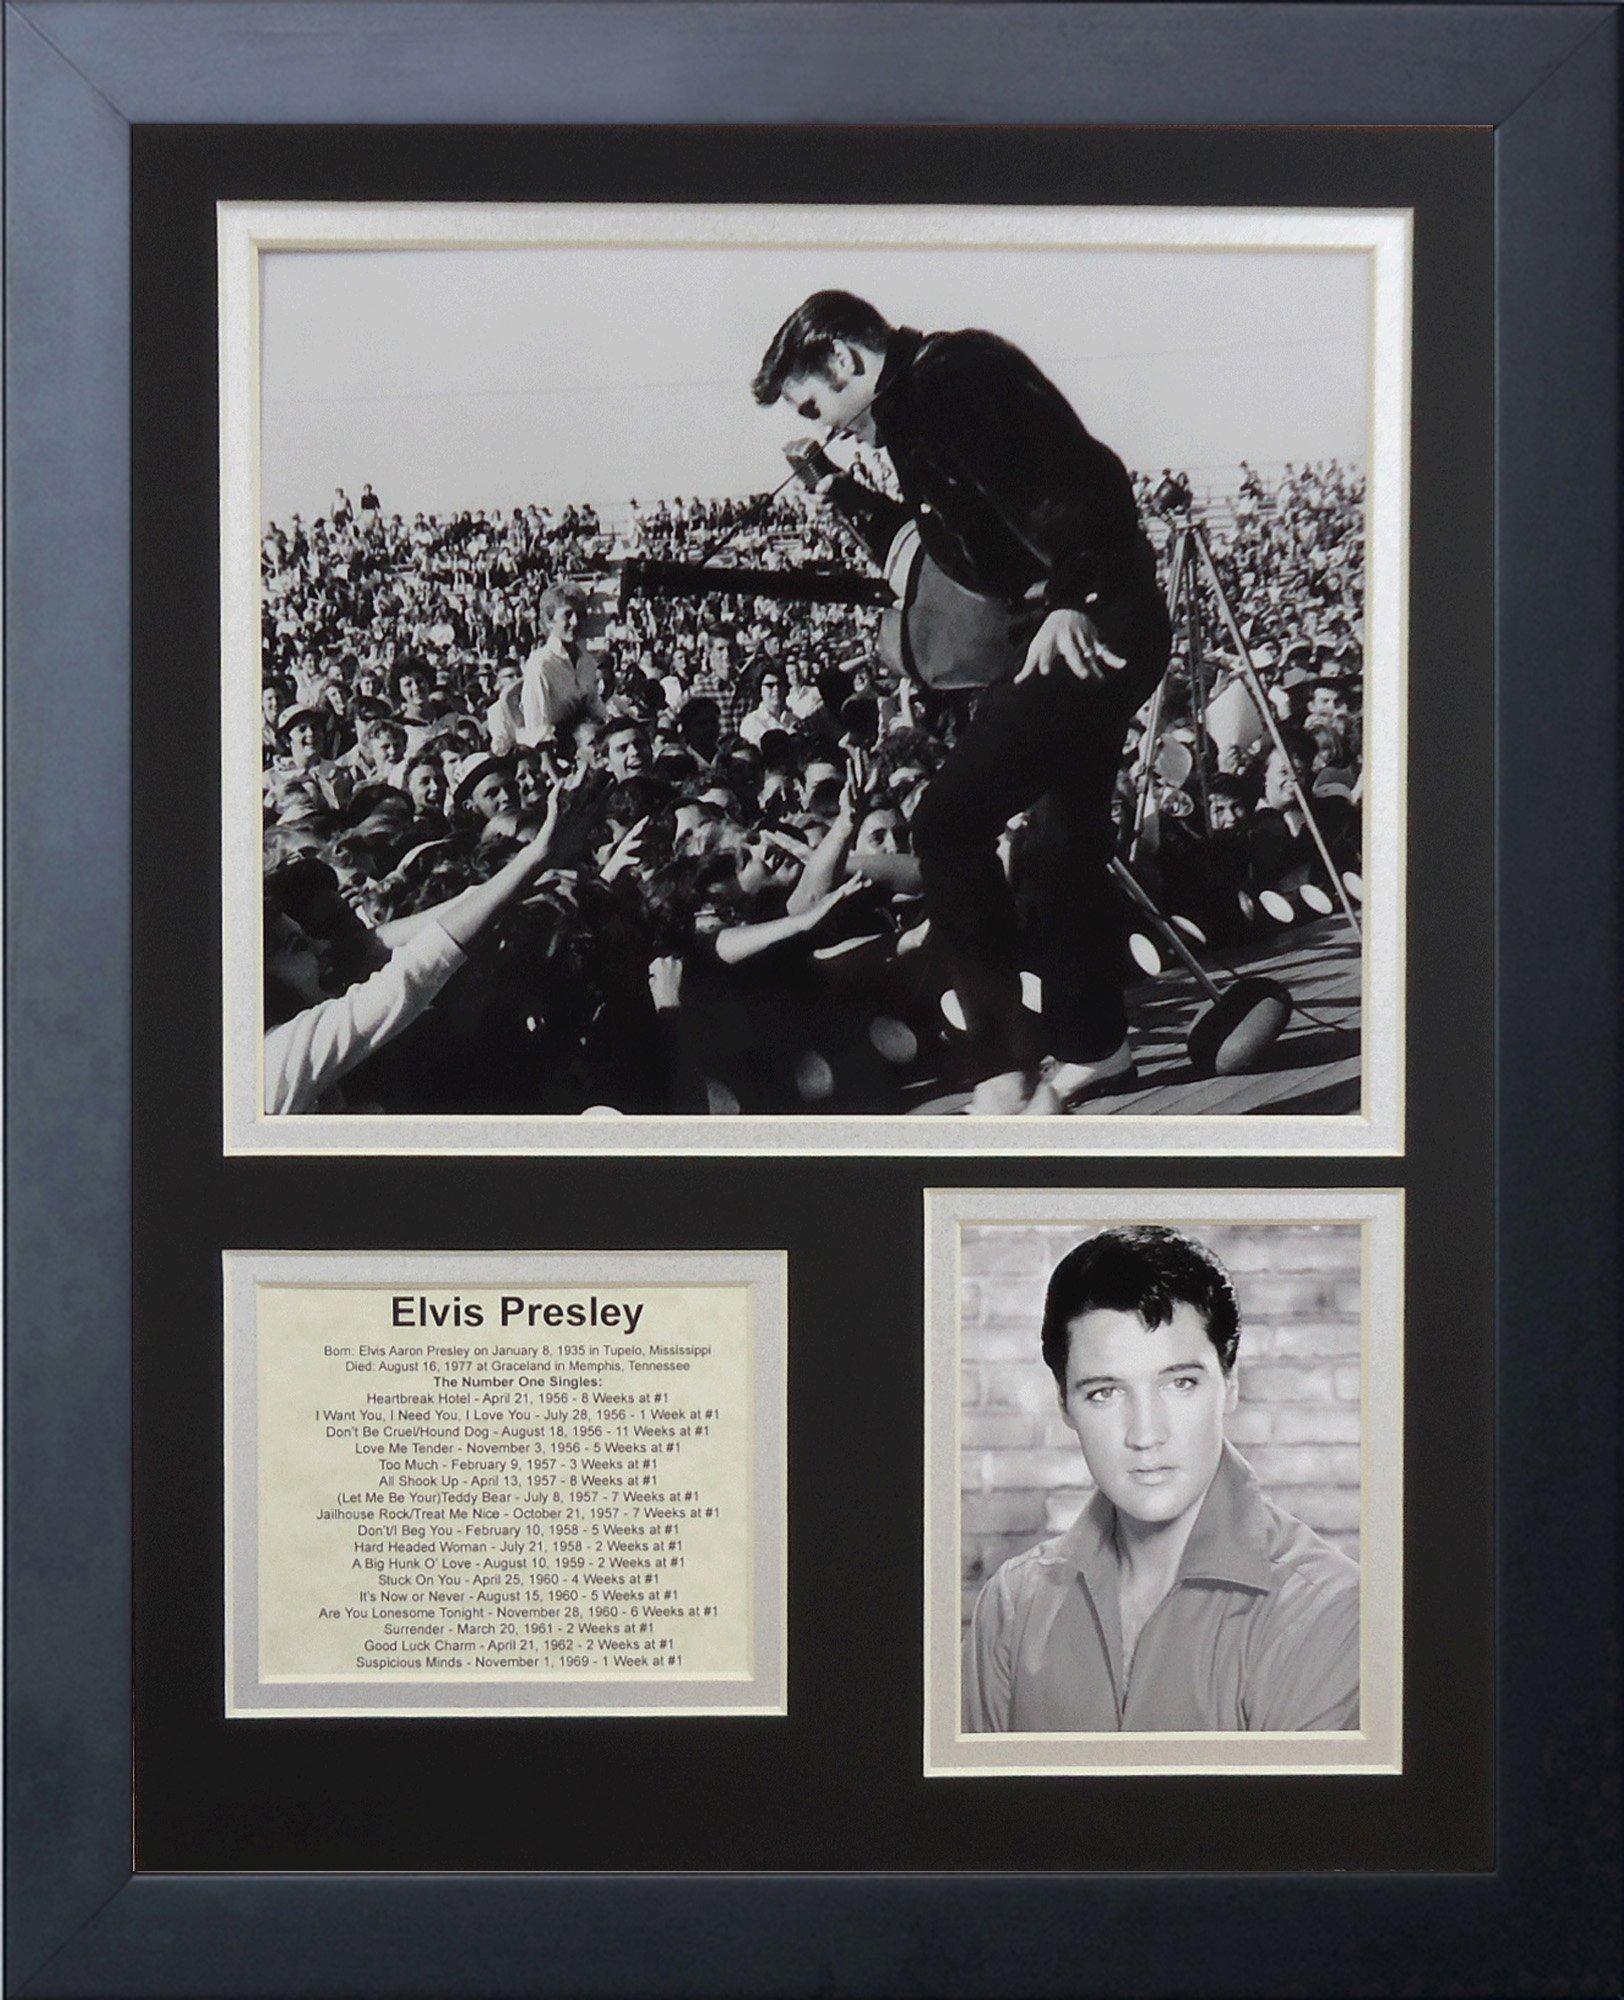 Legends Never Die Elvis Presley Live Framed Photo Collage, 11x14-Inch by Legends Never Die